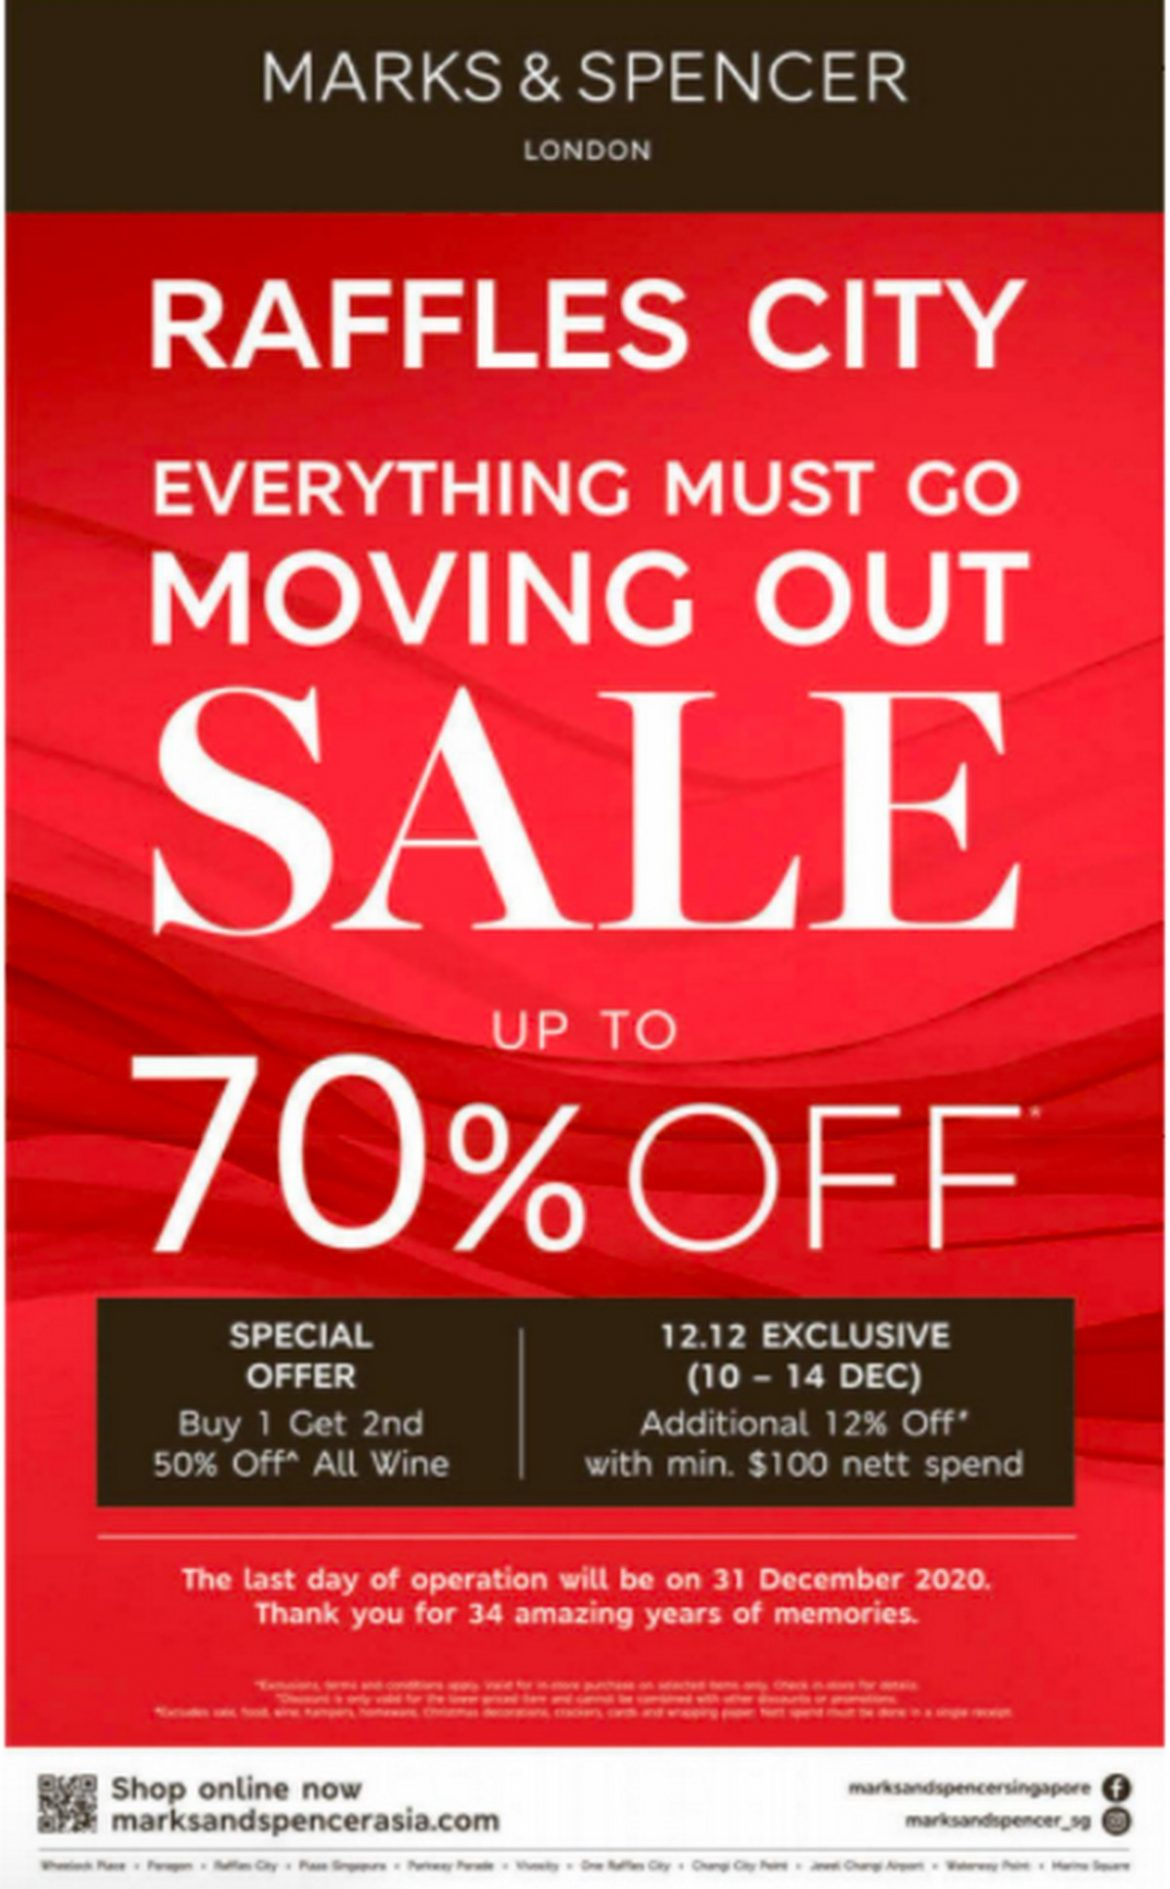 Marks-Spencer-Raffles-City-Moving-Out-Sale 11-31 Dec 2020: Marks & Spencer Raffles City Moving Out Sale